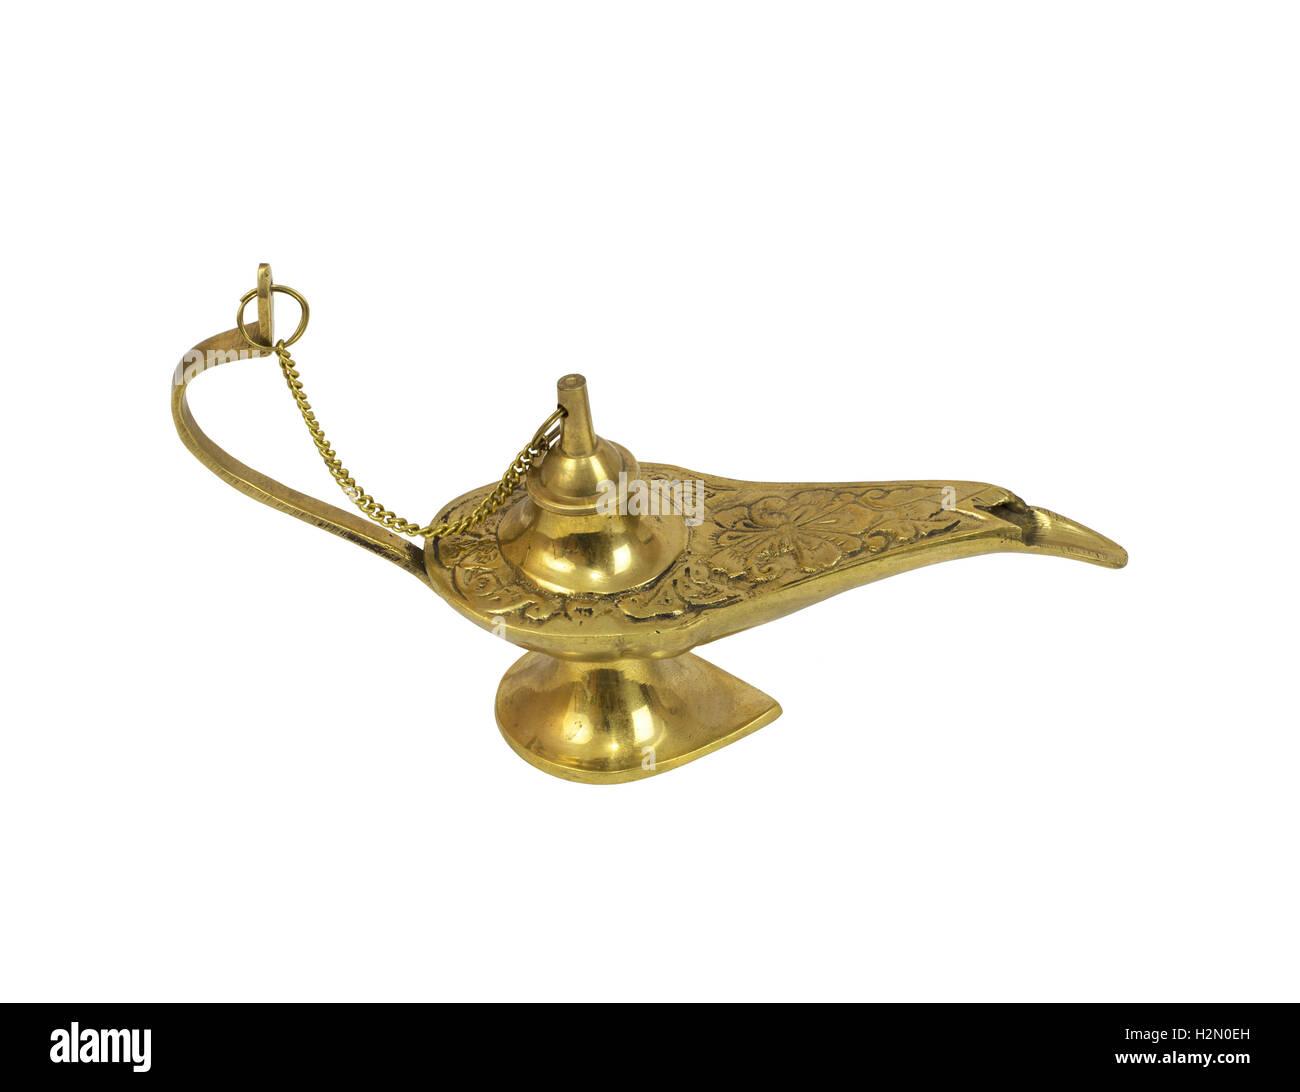 Genie lamp stock photos pictures royalty free genie - Gold Genie Lamp